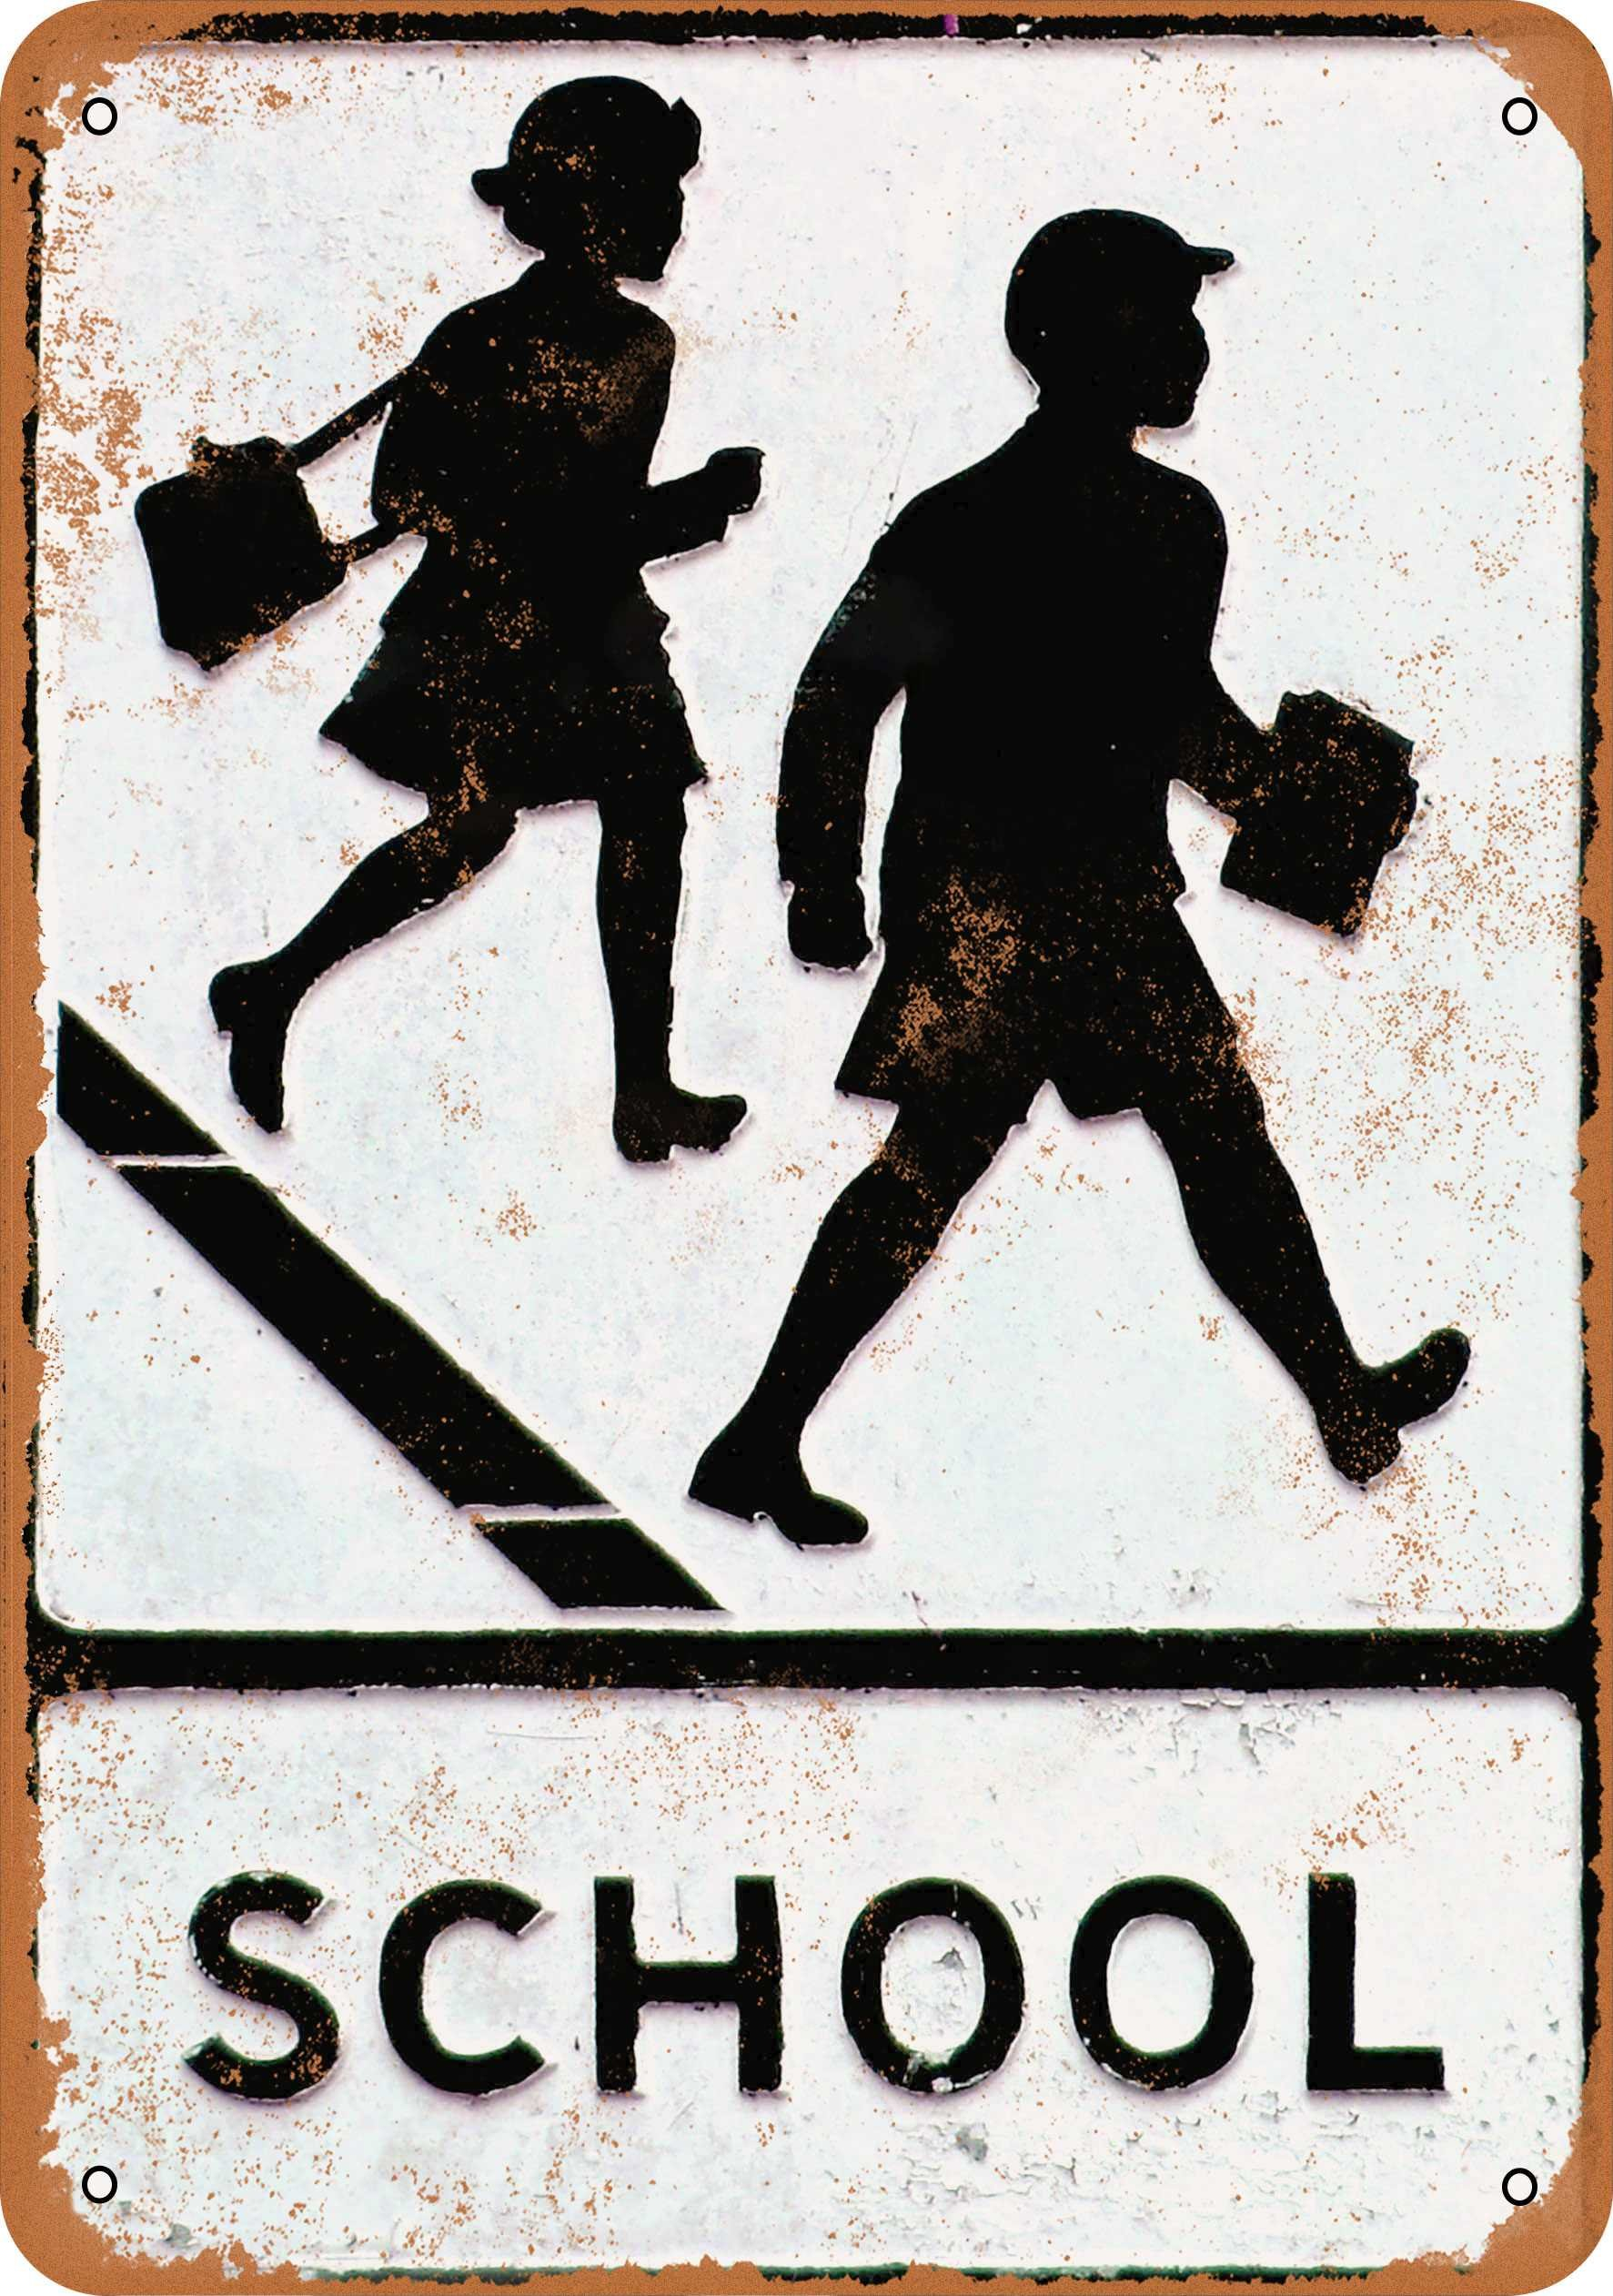 Wall-Color 7 x 10 METAL SIGN - School Crossing - Vintage Look Reproduction